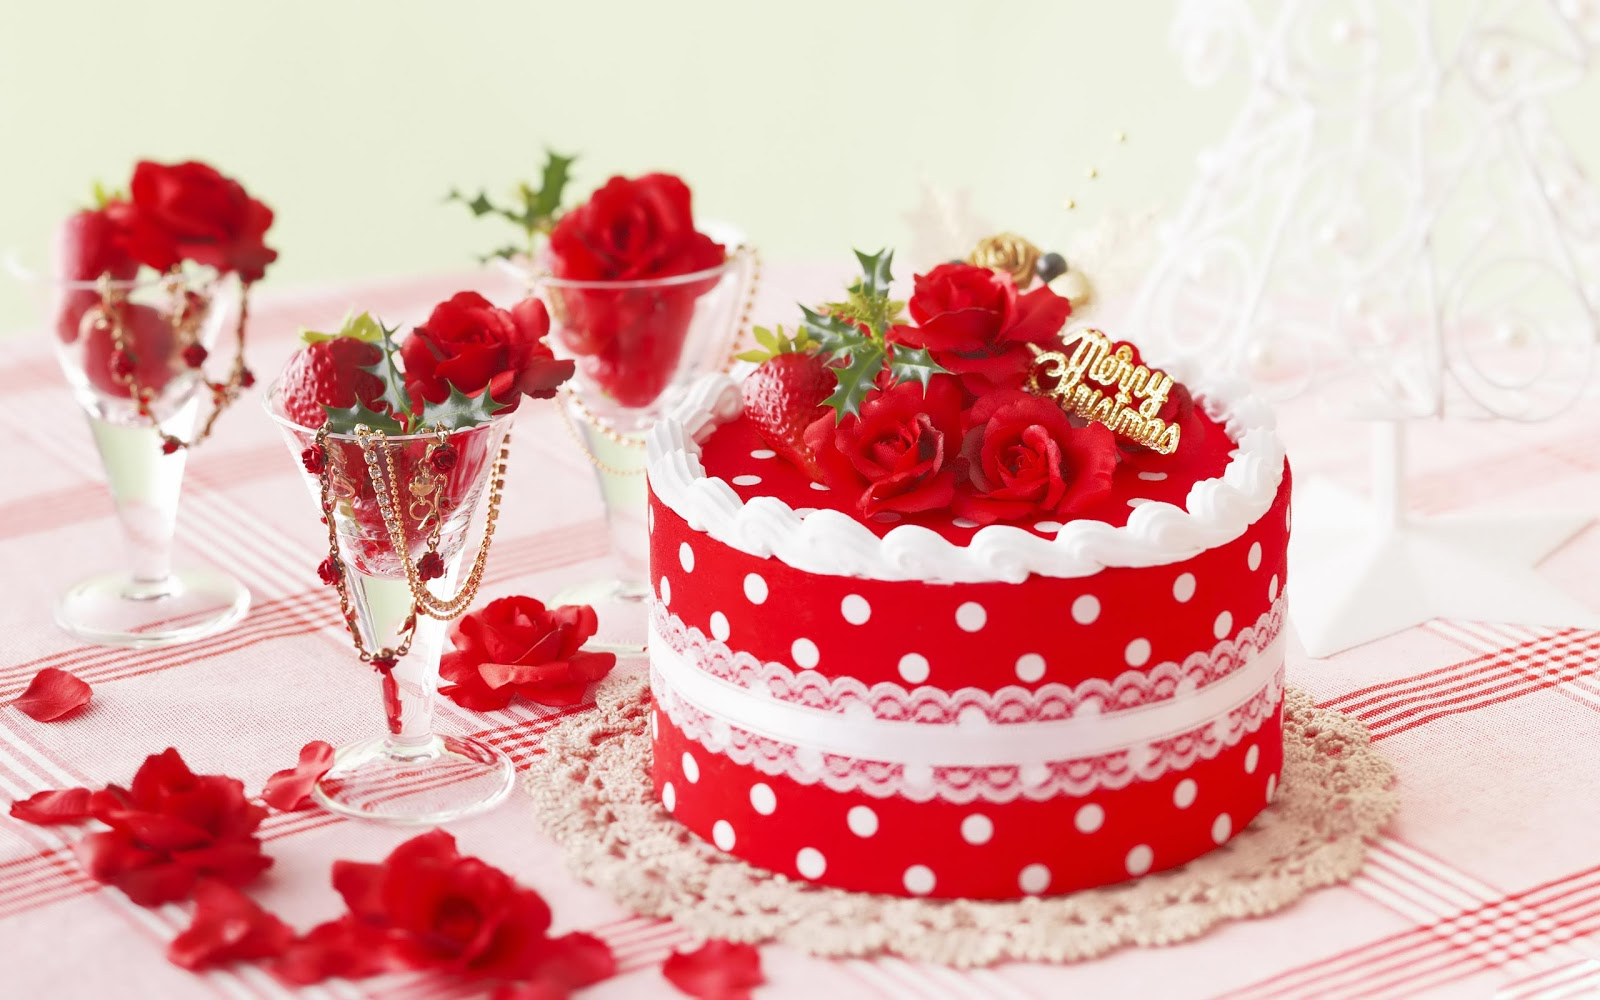 http://1.bp.blogspot.com/-WEwDOUh5Peg/UOSURMxCUCI/AAAAAAAALTg/-NU_dOcjF9k/s1600/Decorated-Christmas-Cake.jpg